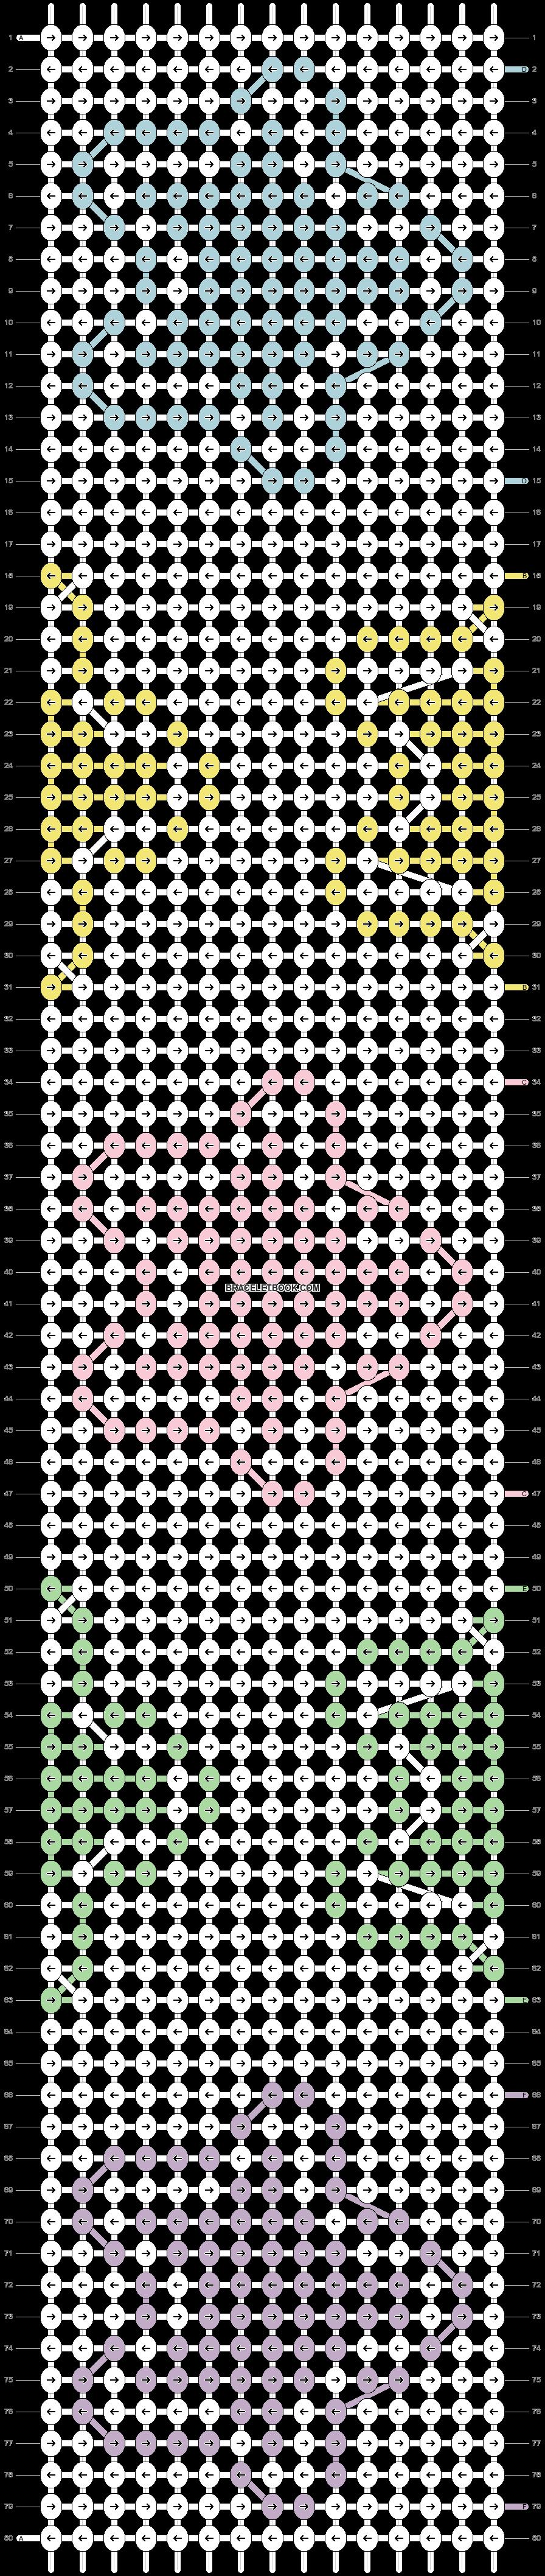 Alpha pattern #39626 pattern